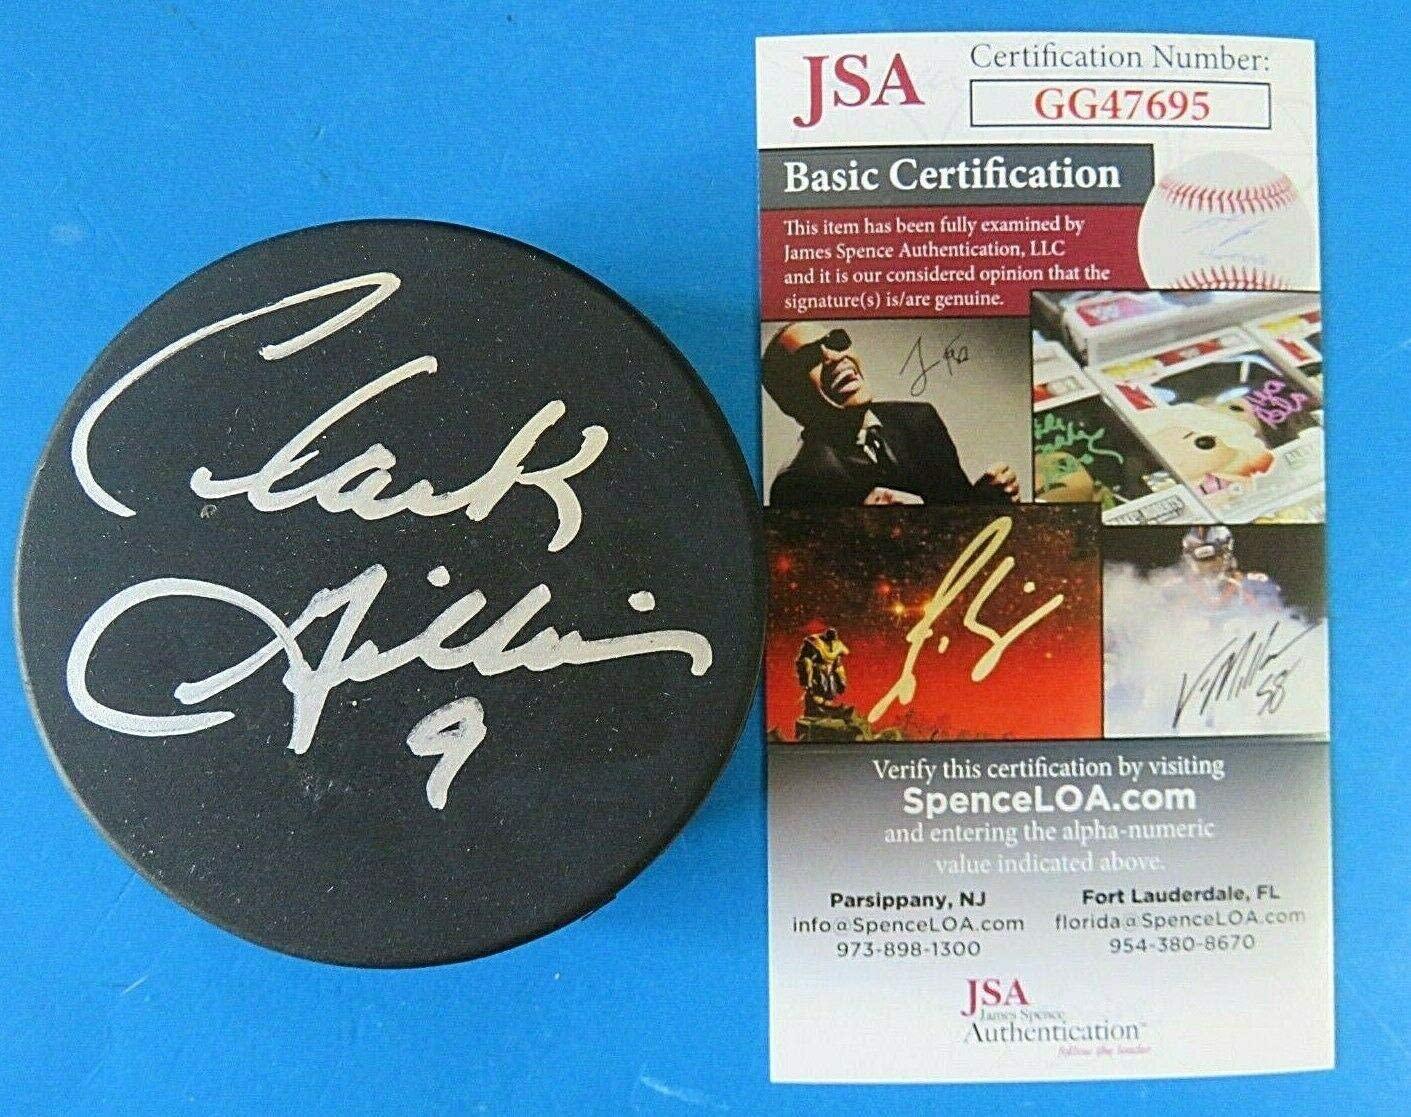 Clark Gillies Autographed Puck - ~ GG47695 - JSA Certified - Autographed NHL Pucks